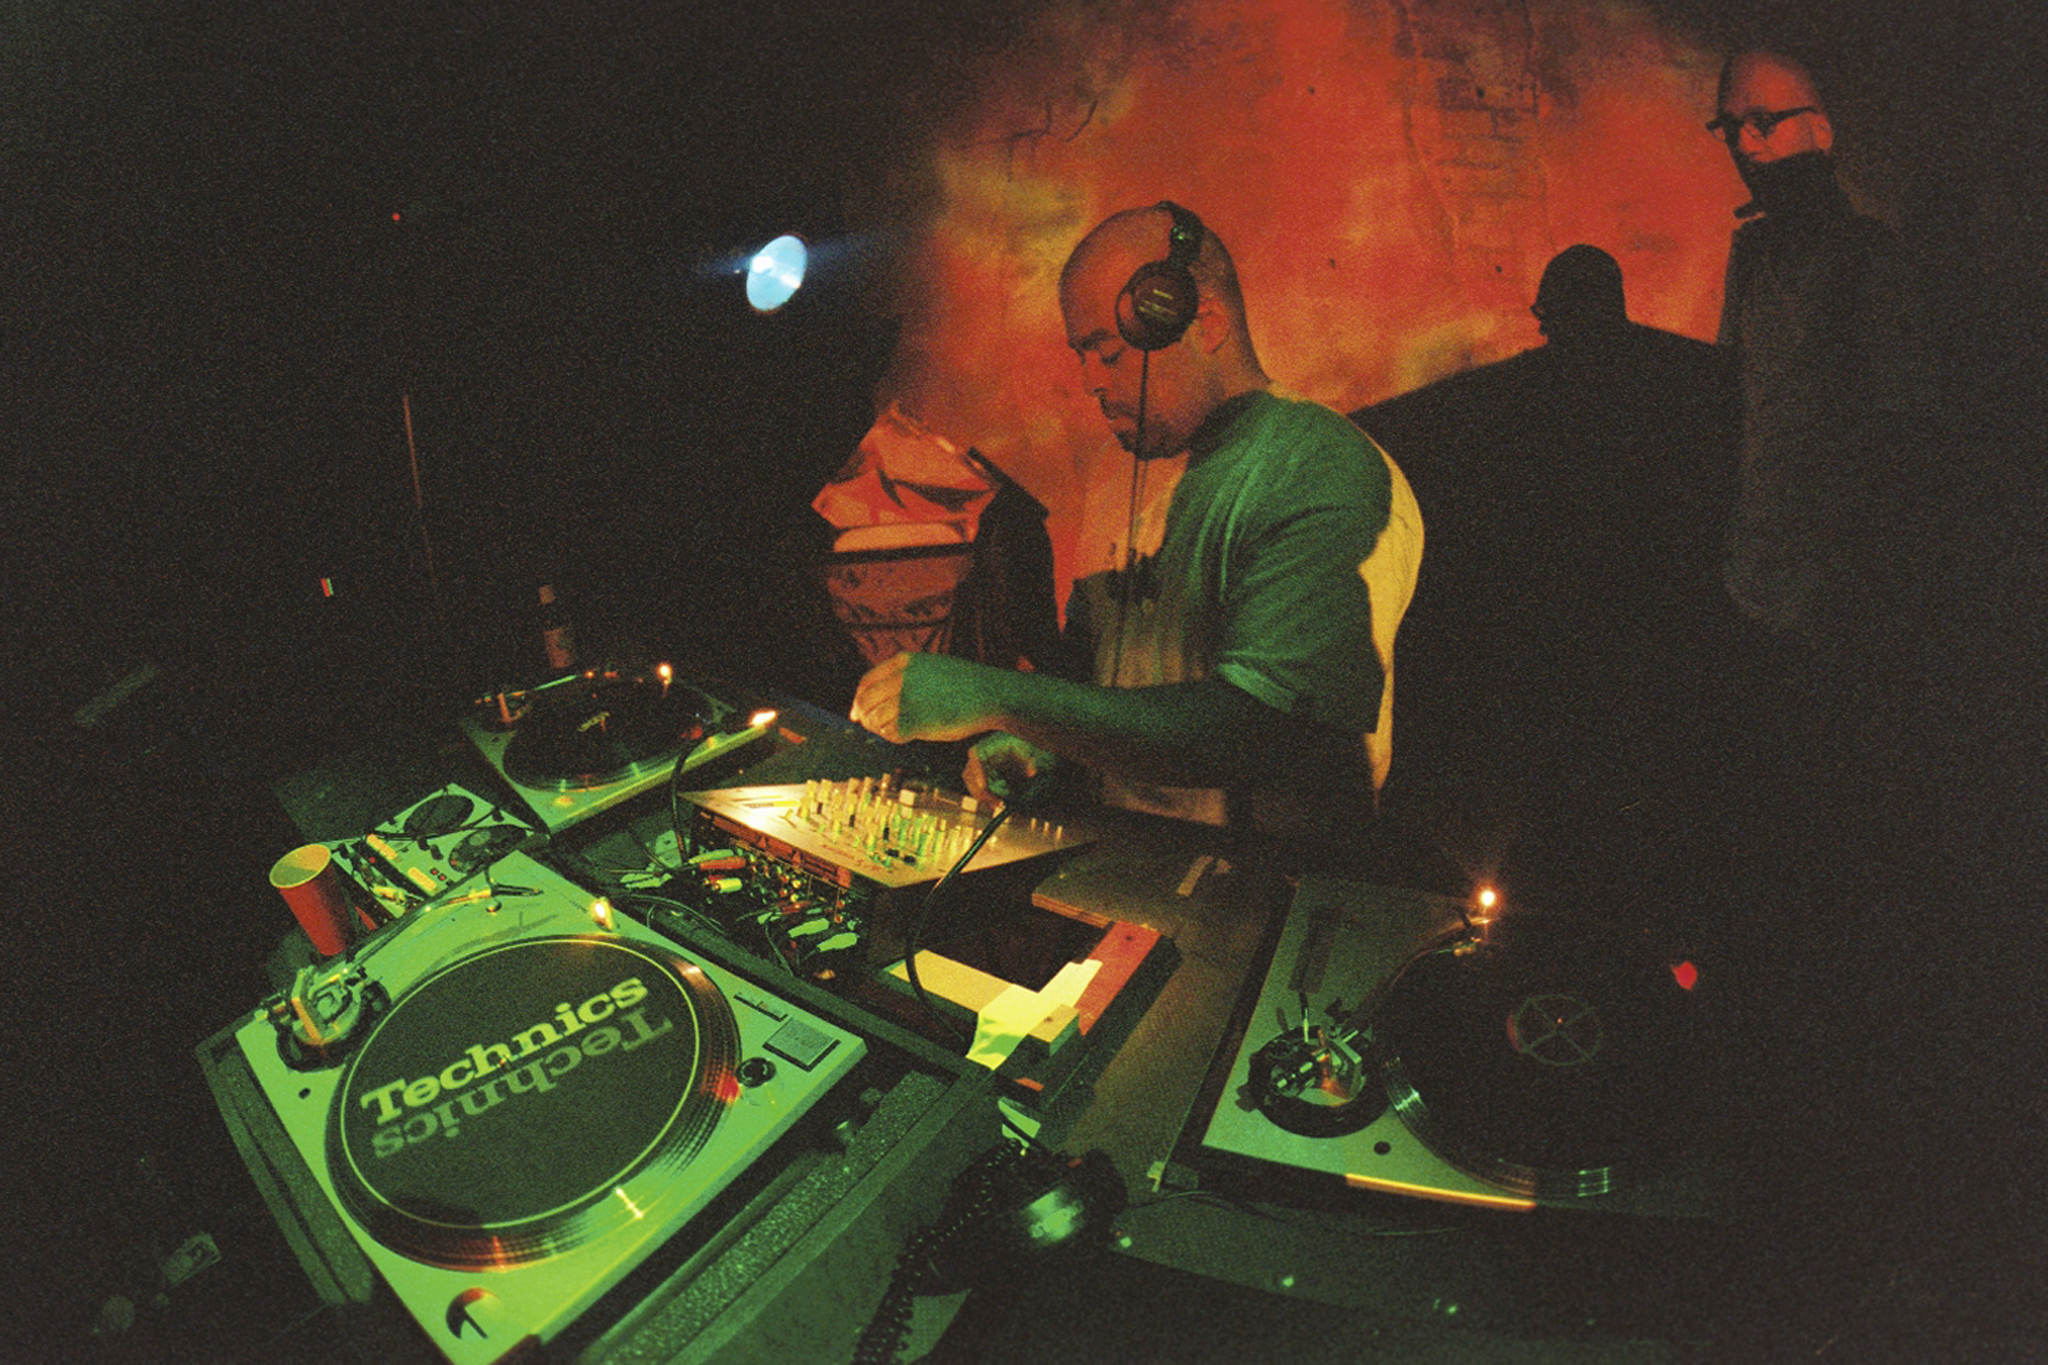 Exit System: DJ Bone + DJ Spider + L'estasi Dell'oro + Nihal Thomas